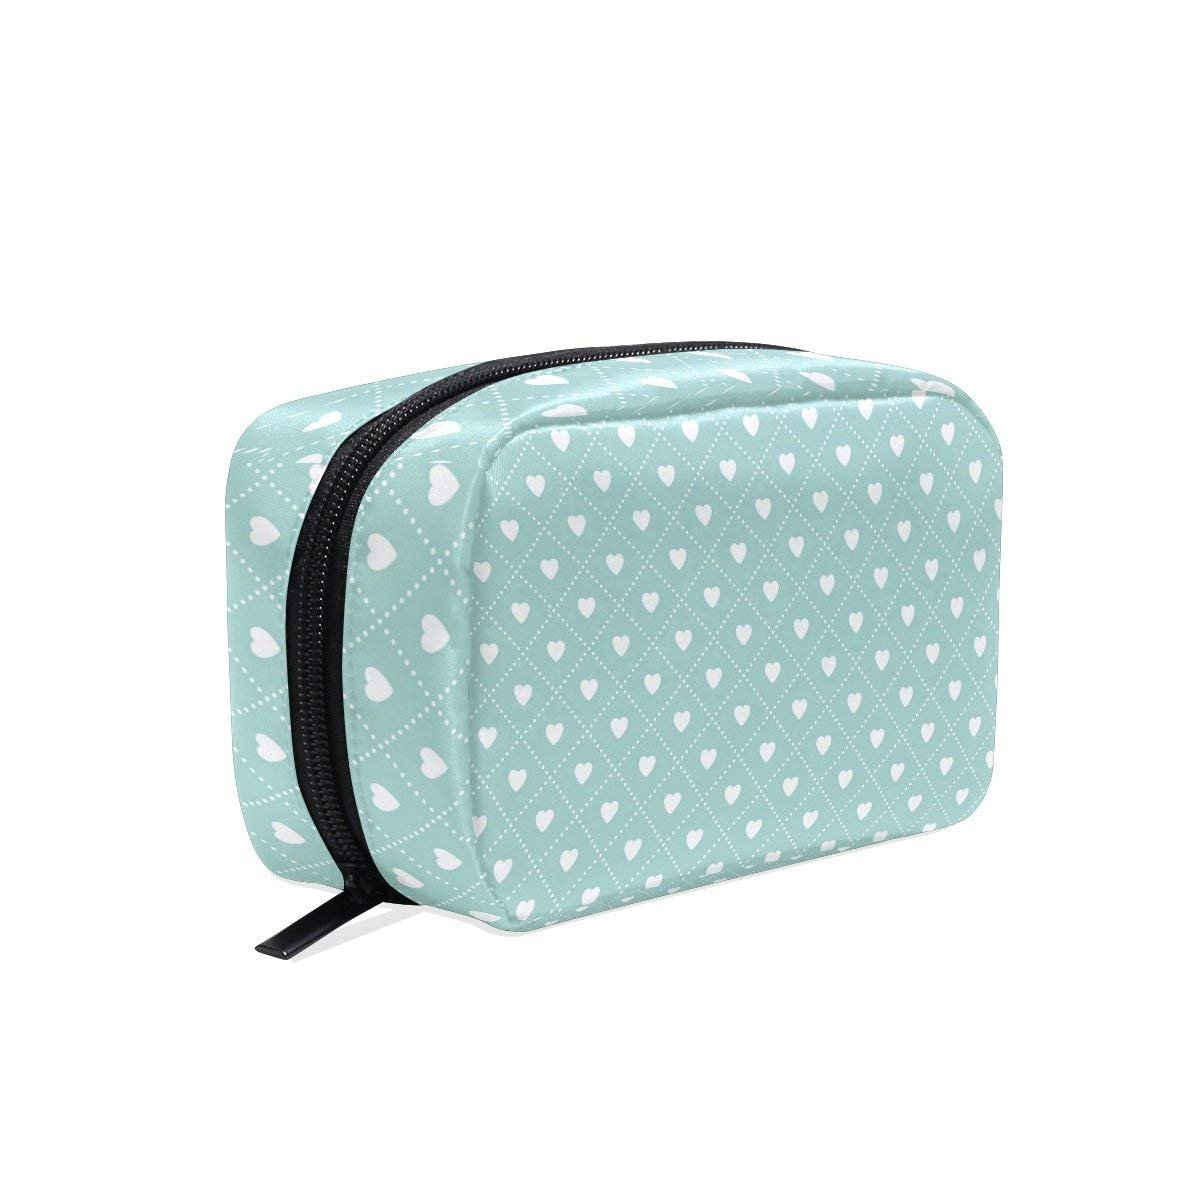 Love Point Blue Green Cosmetic Bag Black Zipper Storage Bag Portable Ladies Travel Square Makeup Brushes Bag